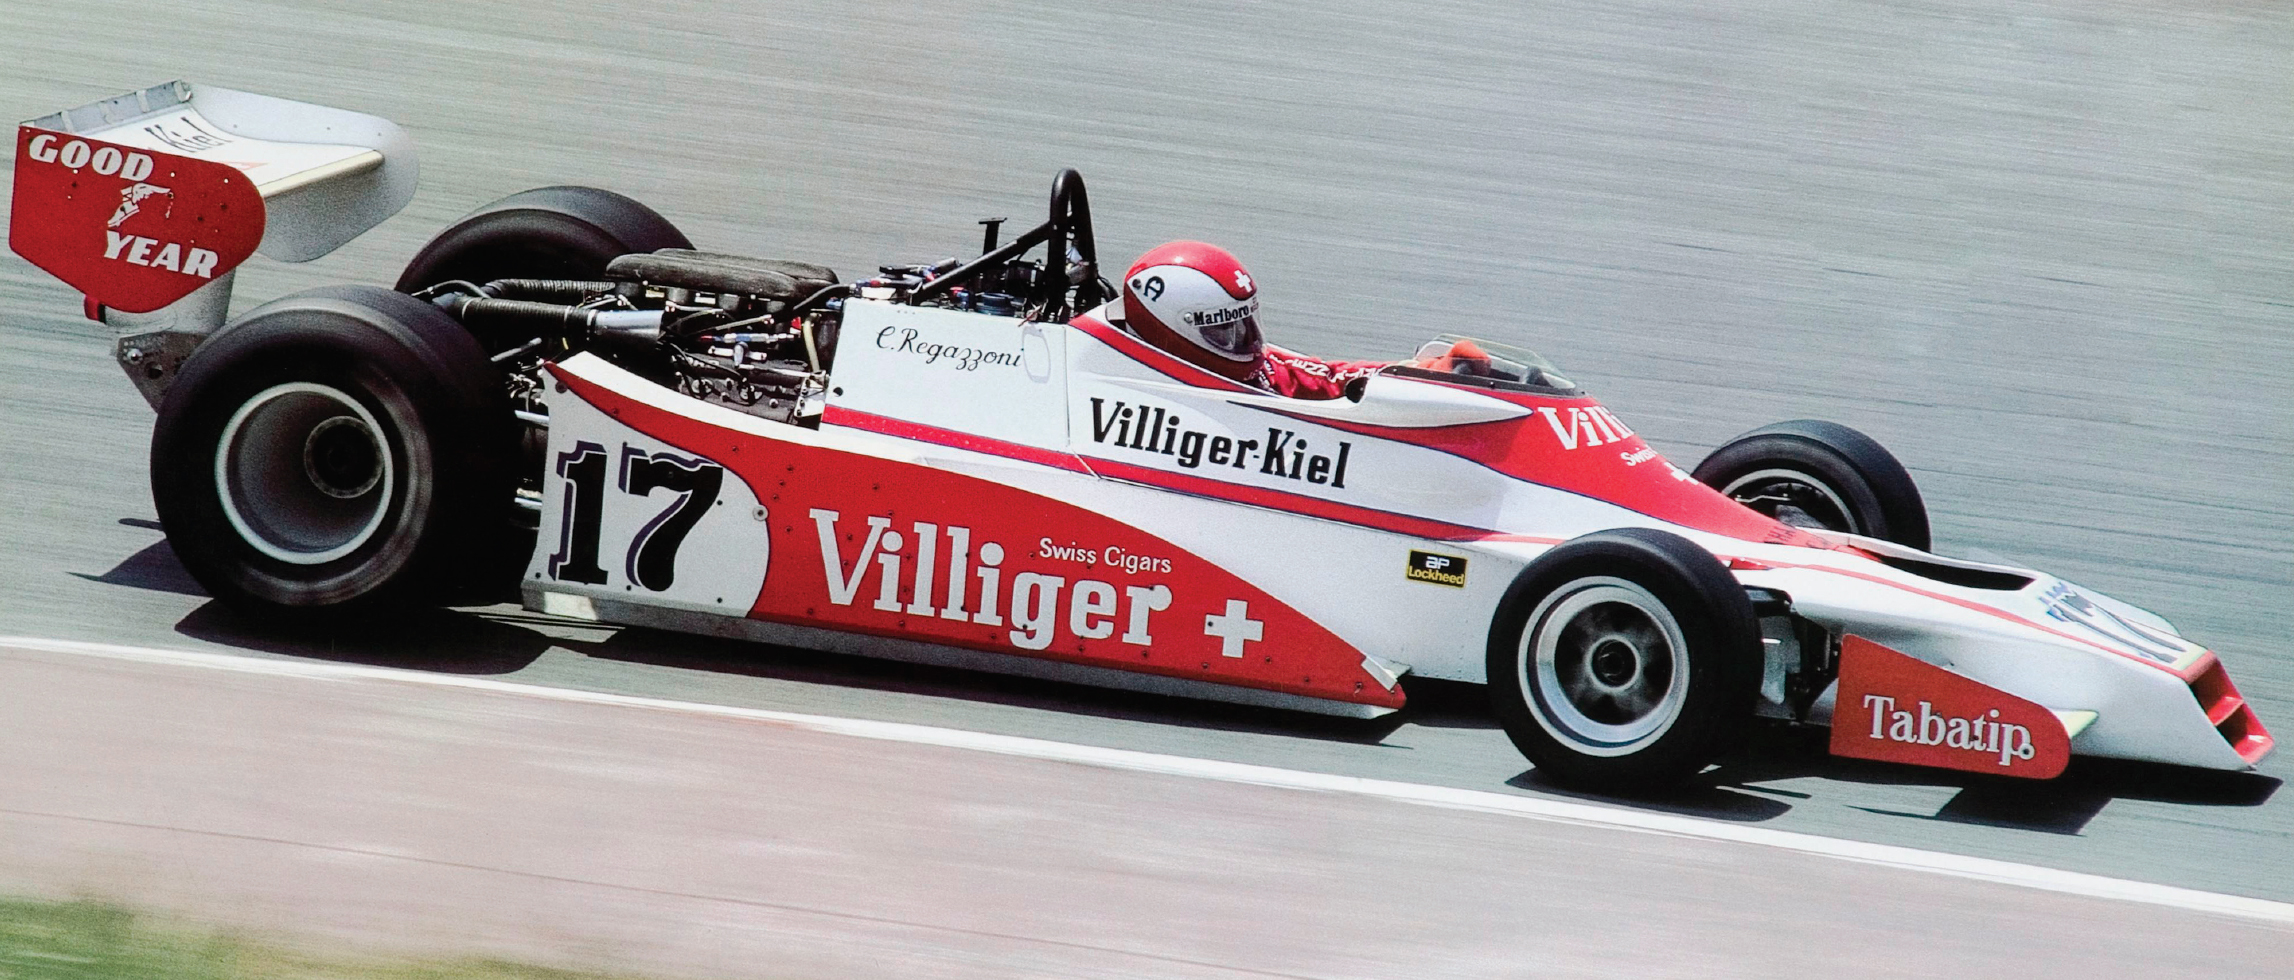 Villiger Cigars | Formula 1 Race Car